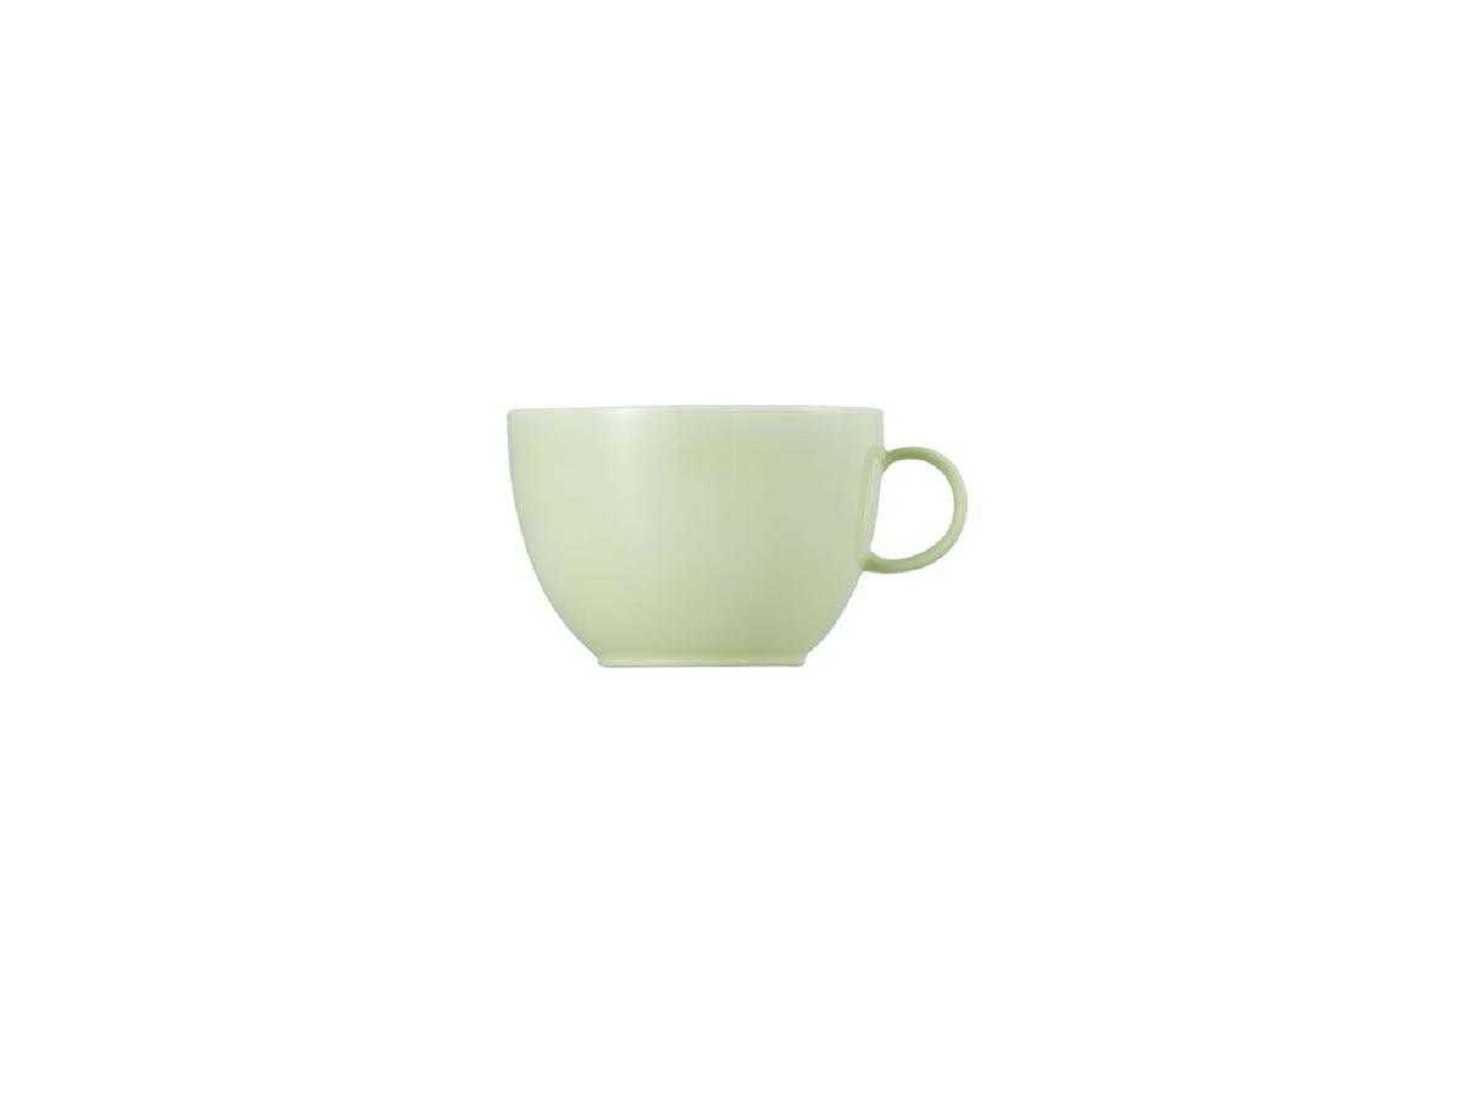 Онлайн каталог PROMENU: Чашка фарфоровая Rosenthal SUNNY DAY, объем 0,2 л, зеленый Rosenthal 70850-408512-14642